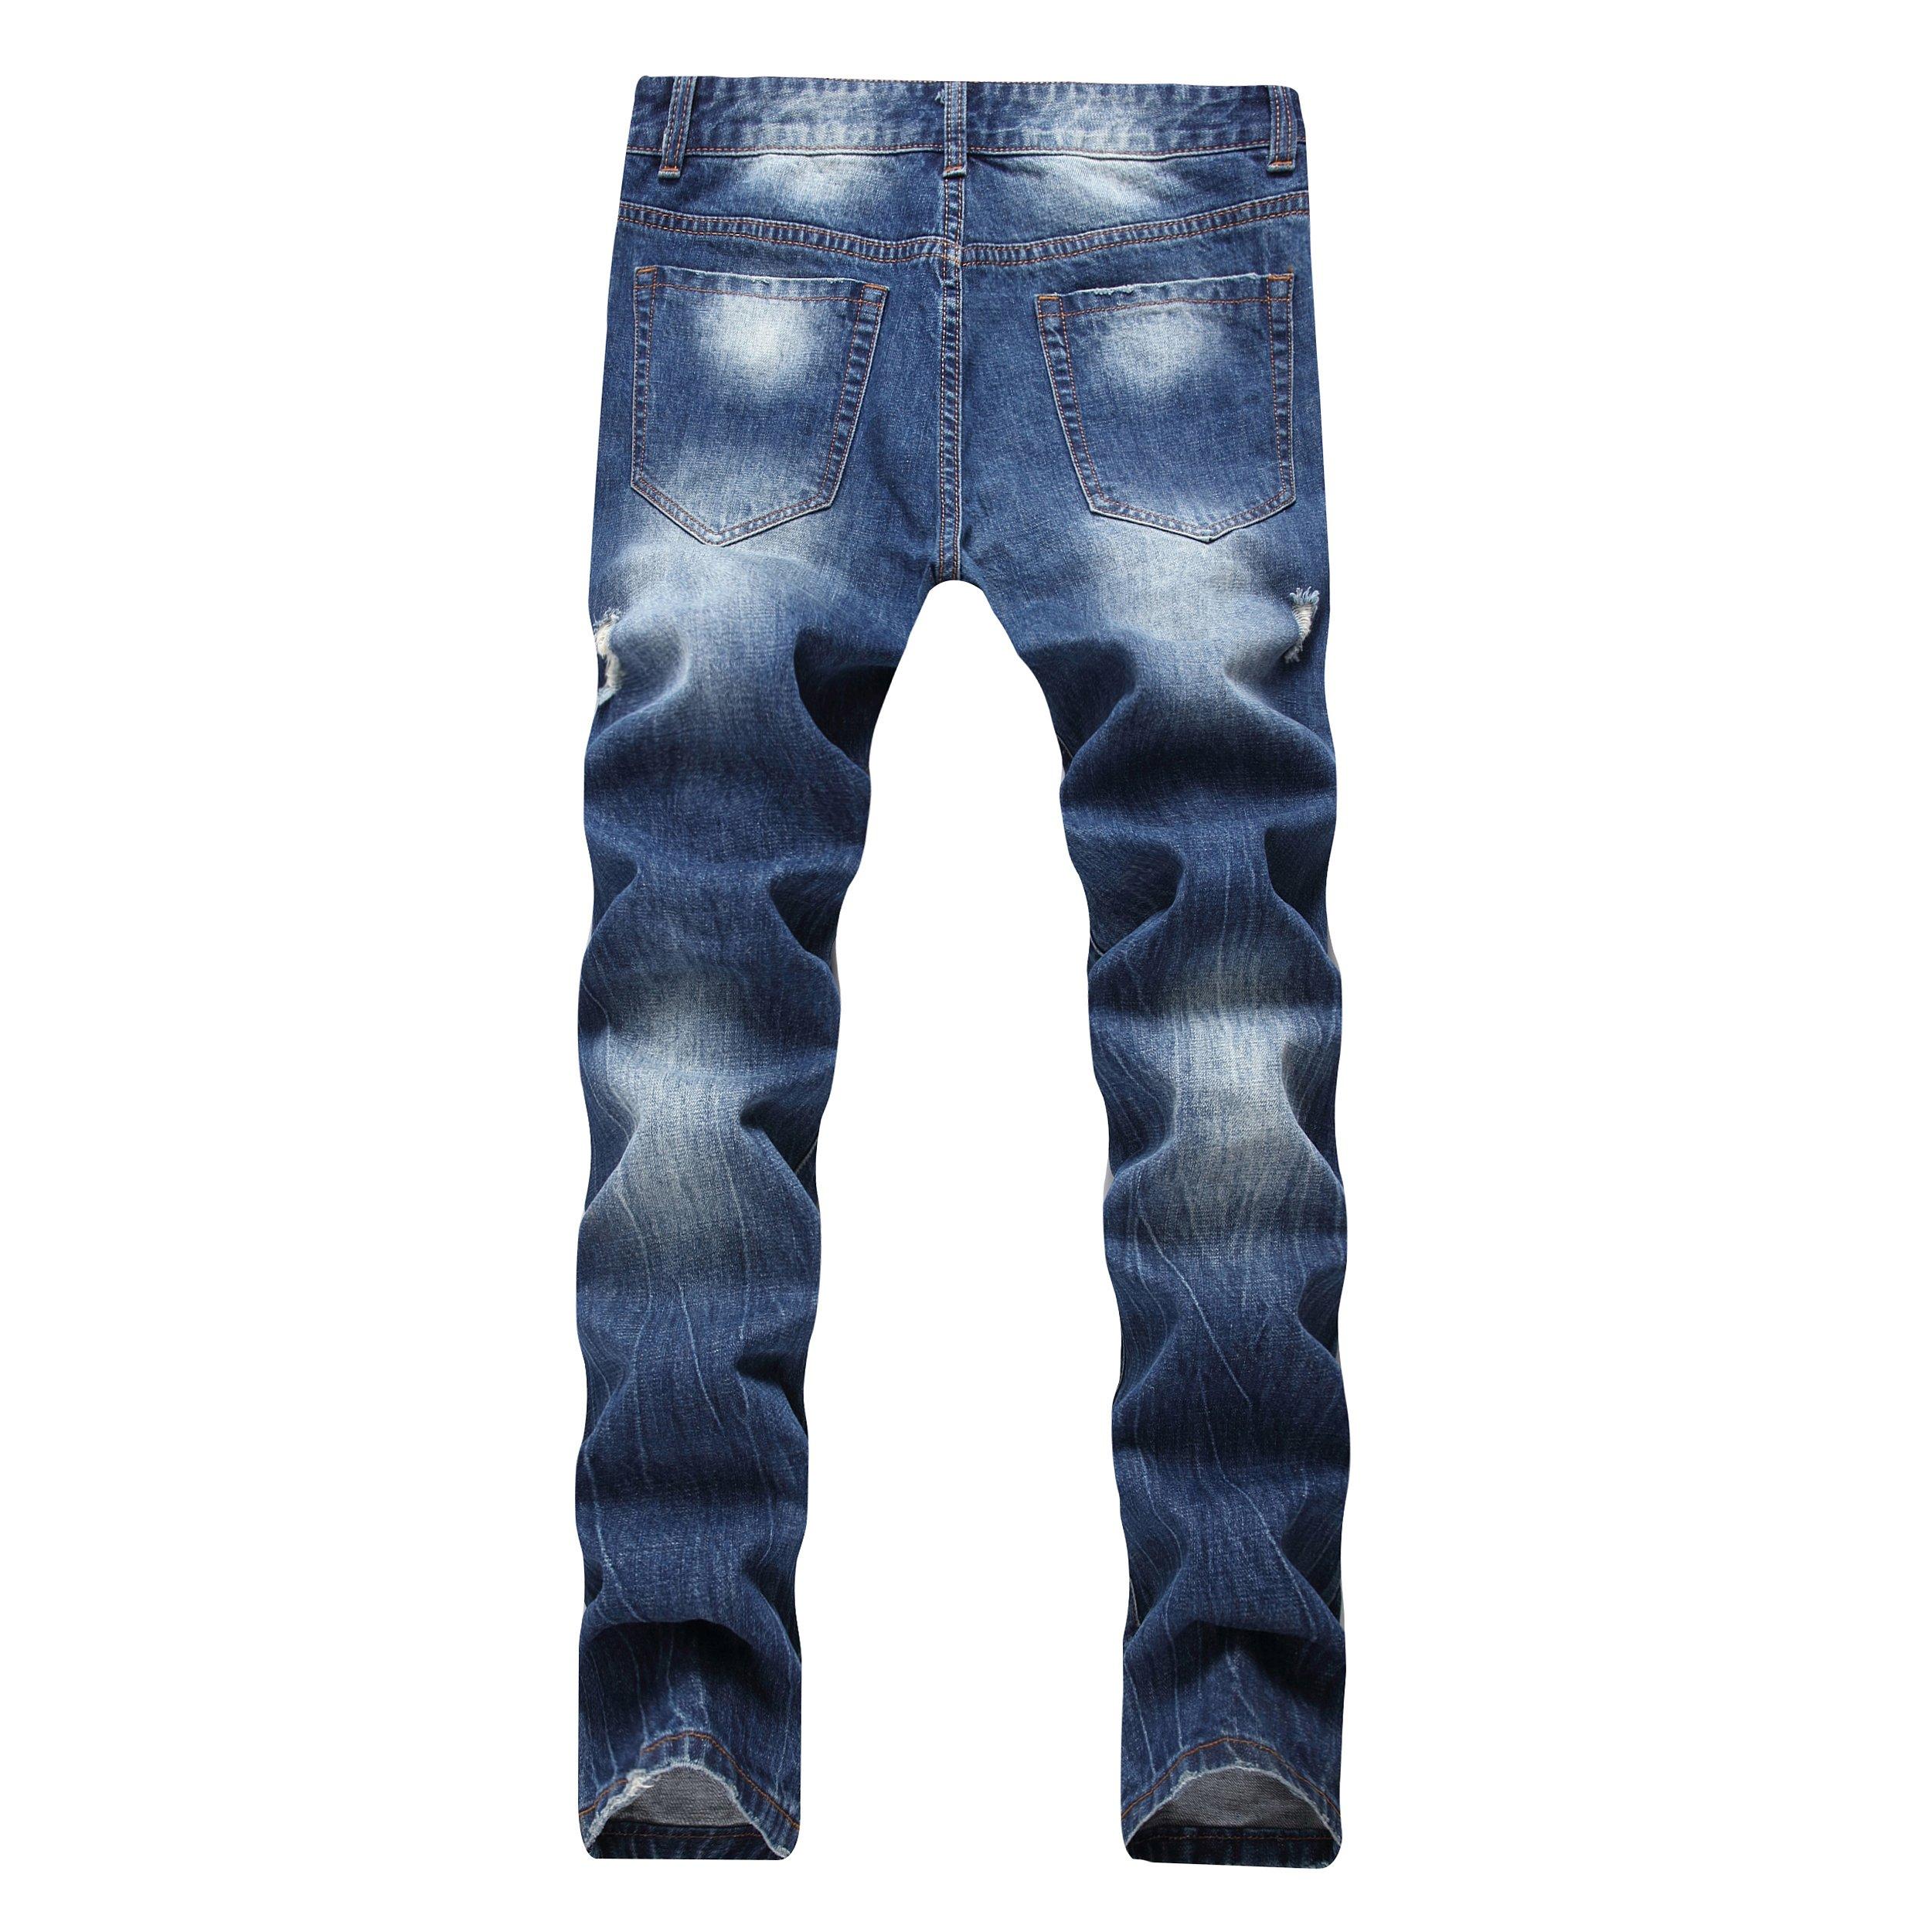 DAVID.ANN Men's Straight Fit Distressed Ripped Denim Jeans,Blue,32 by DAVID.ANN (Image #2)